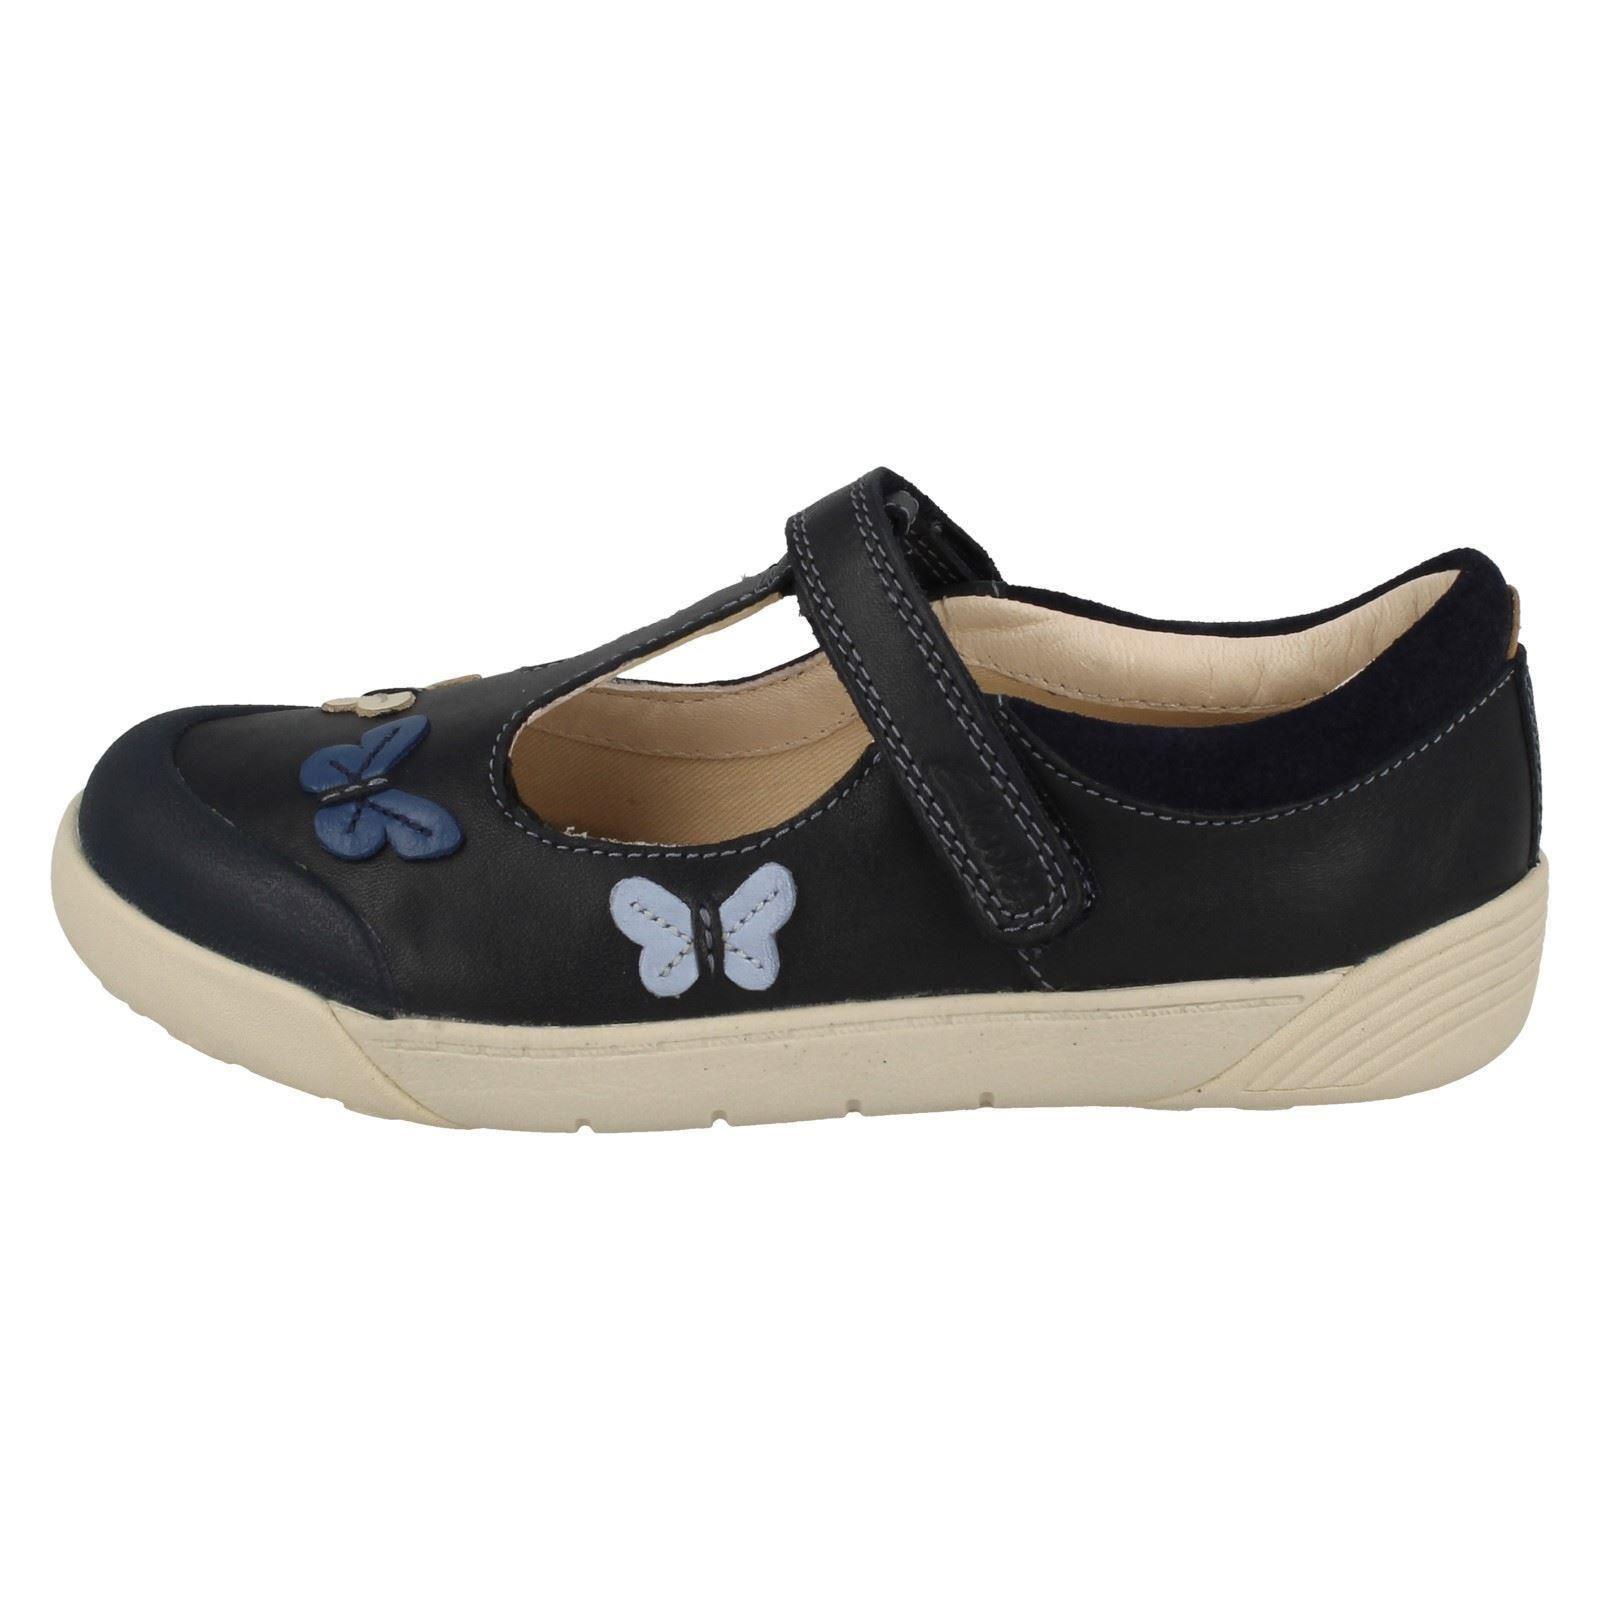 Clarks Folk Zapatos Flo para T Lil bar azul niñas marino azul dEEqAFr